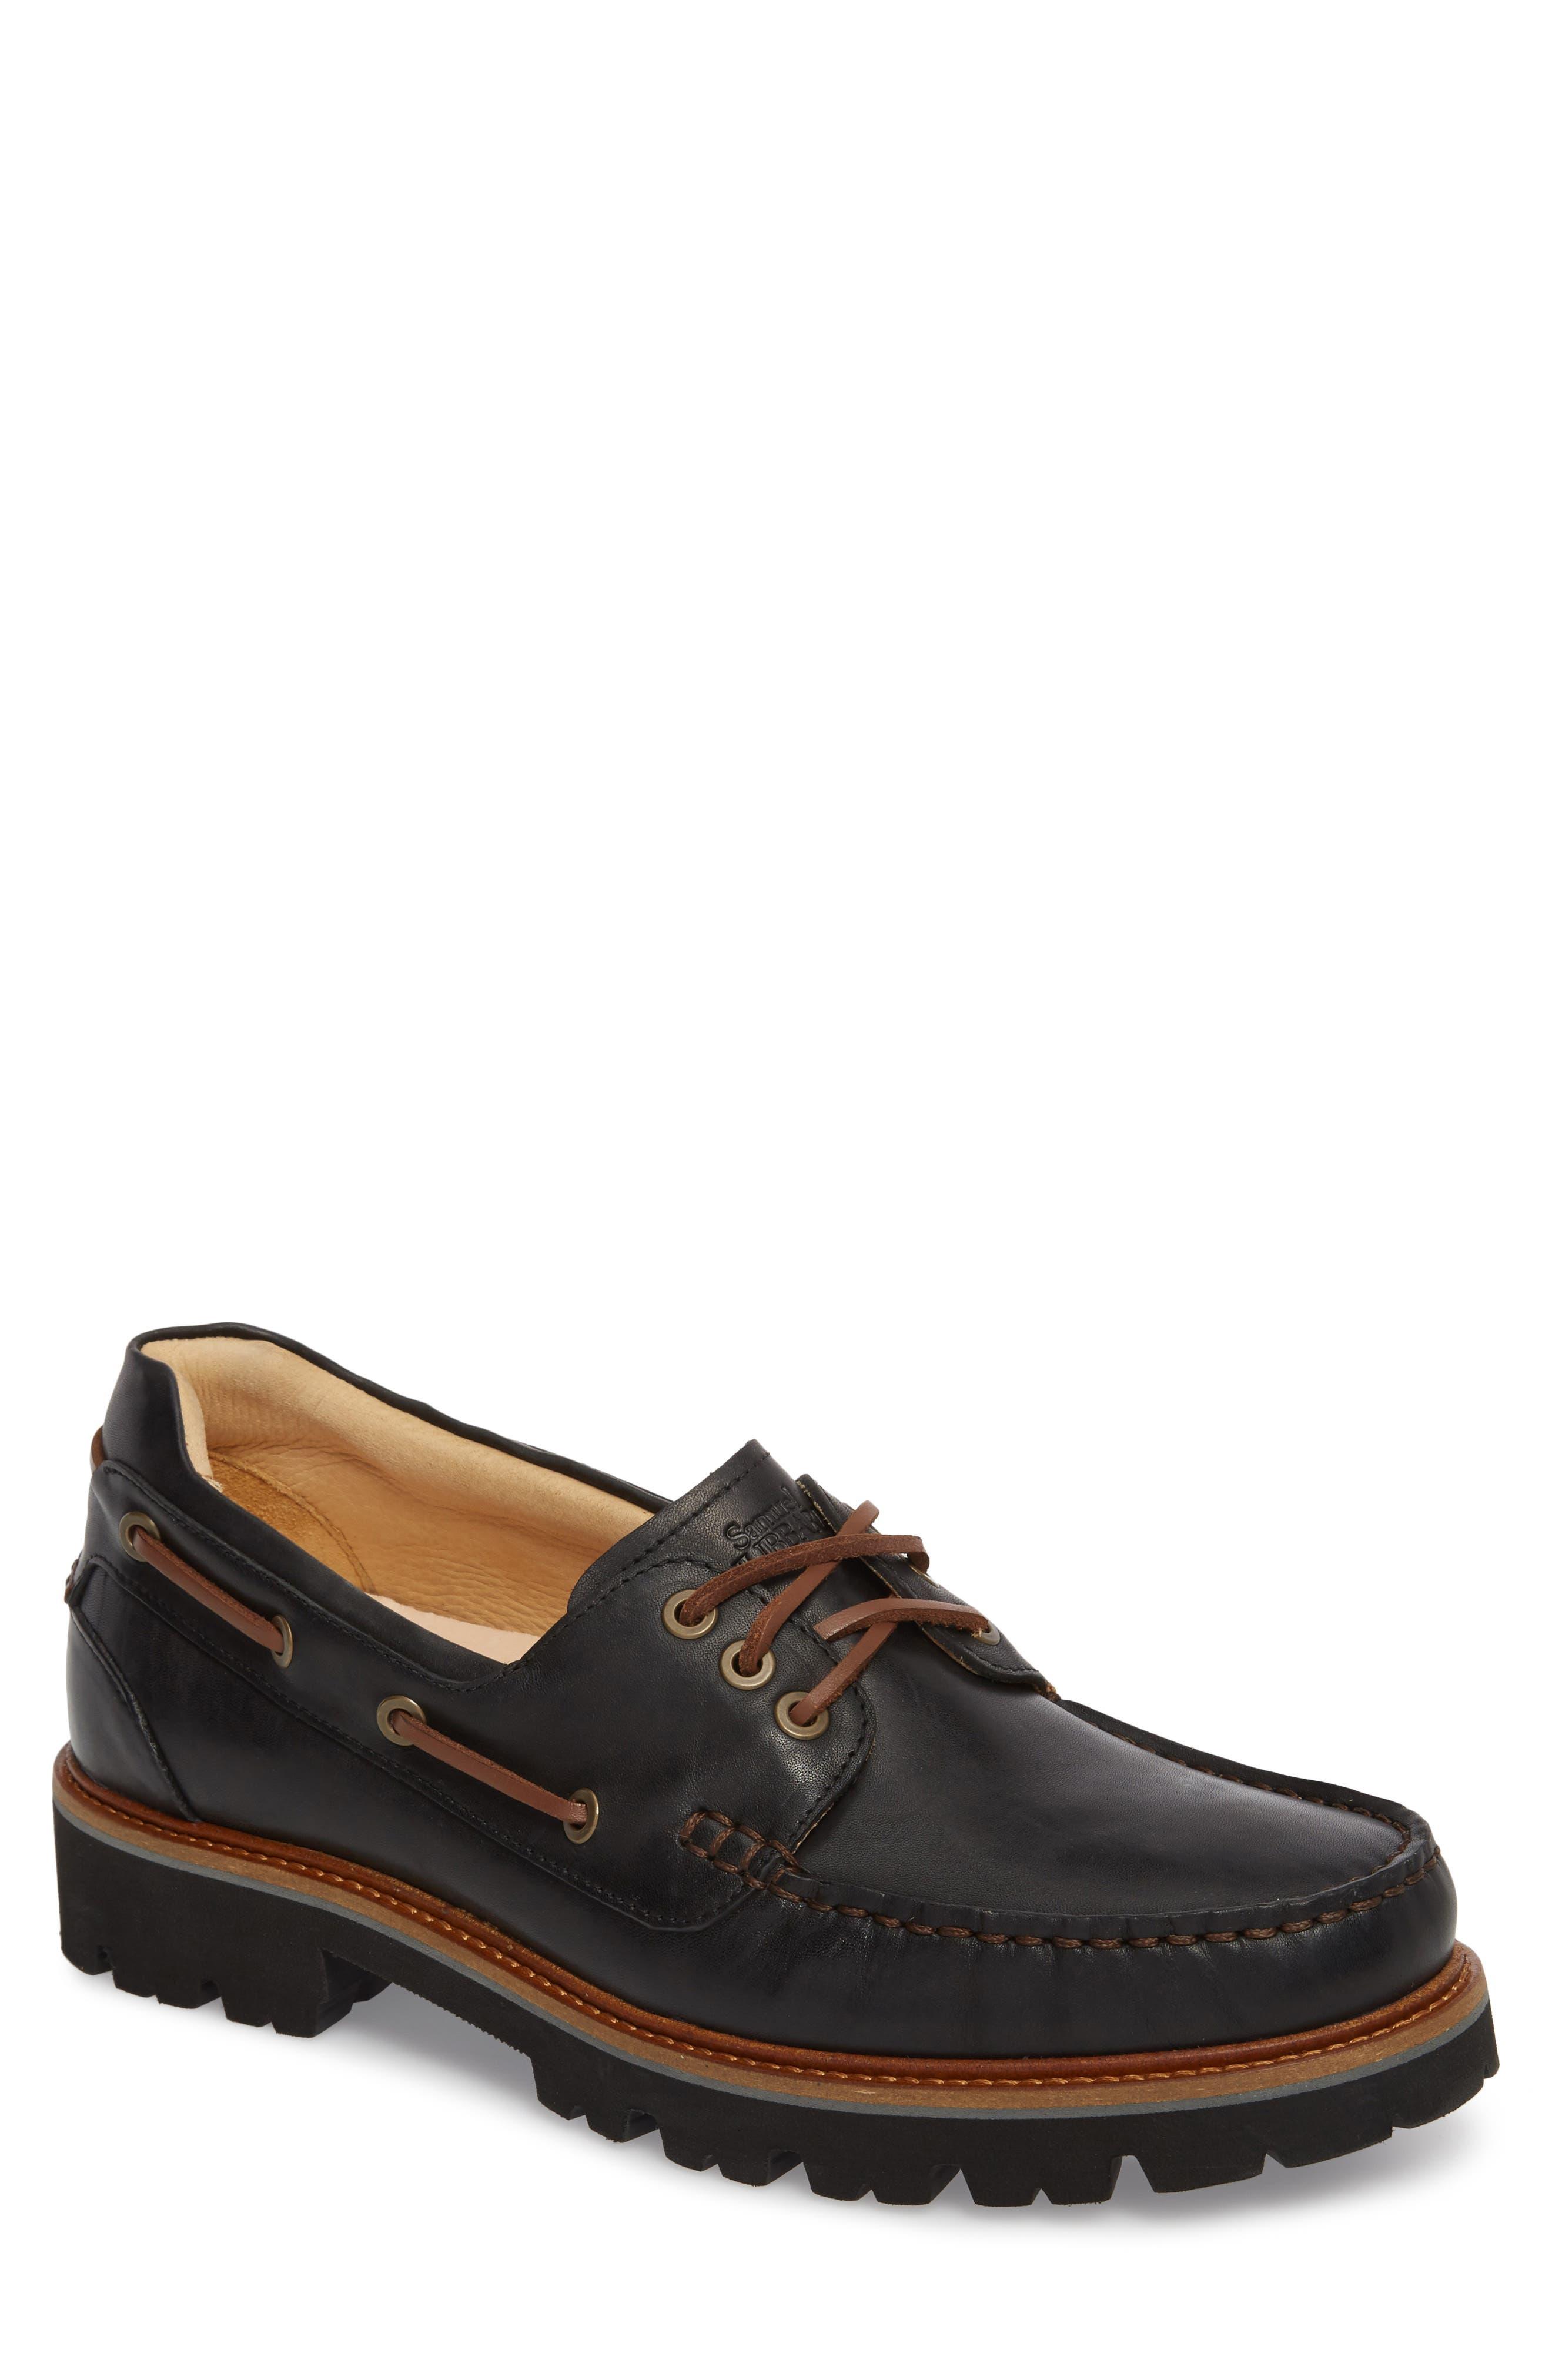 Camplight Water Resistant Boat Shoe,                             Main thumbnail 1, color,                             Saddlebag Black Leather